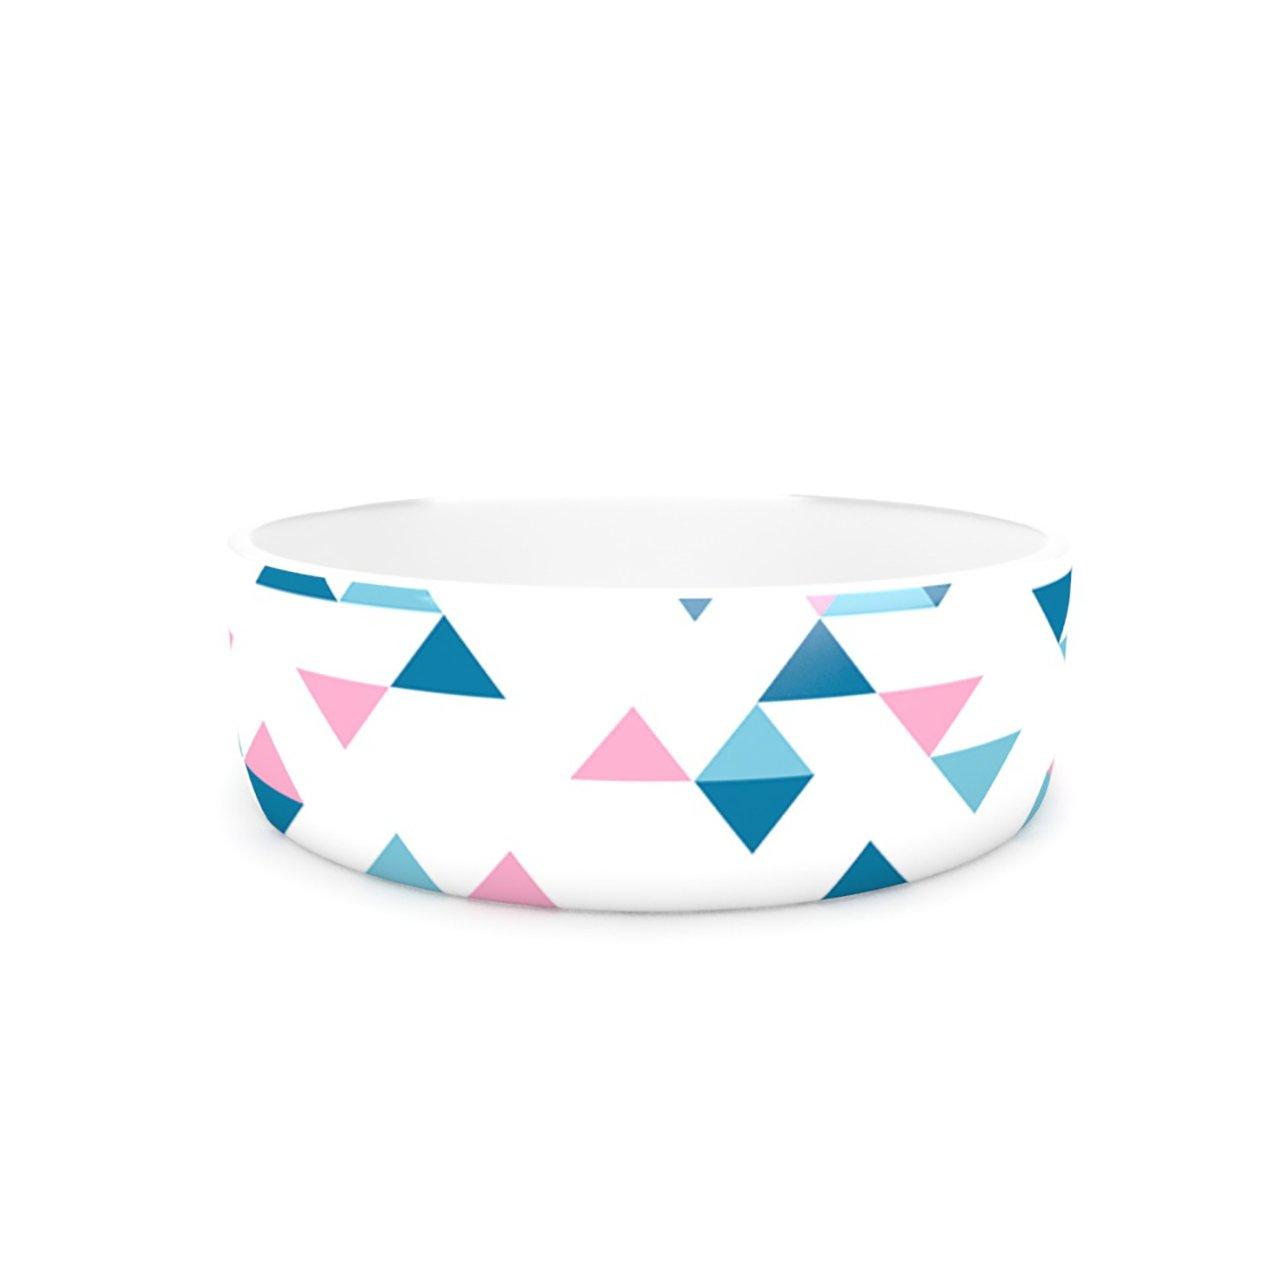 Kess InHouse Project M Triangles Pink  Pet Bowl, 7-Inch, bluesh bluee